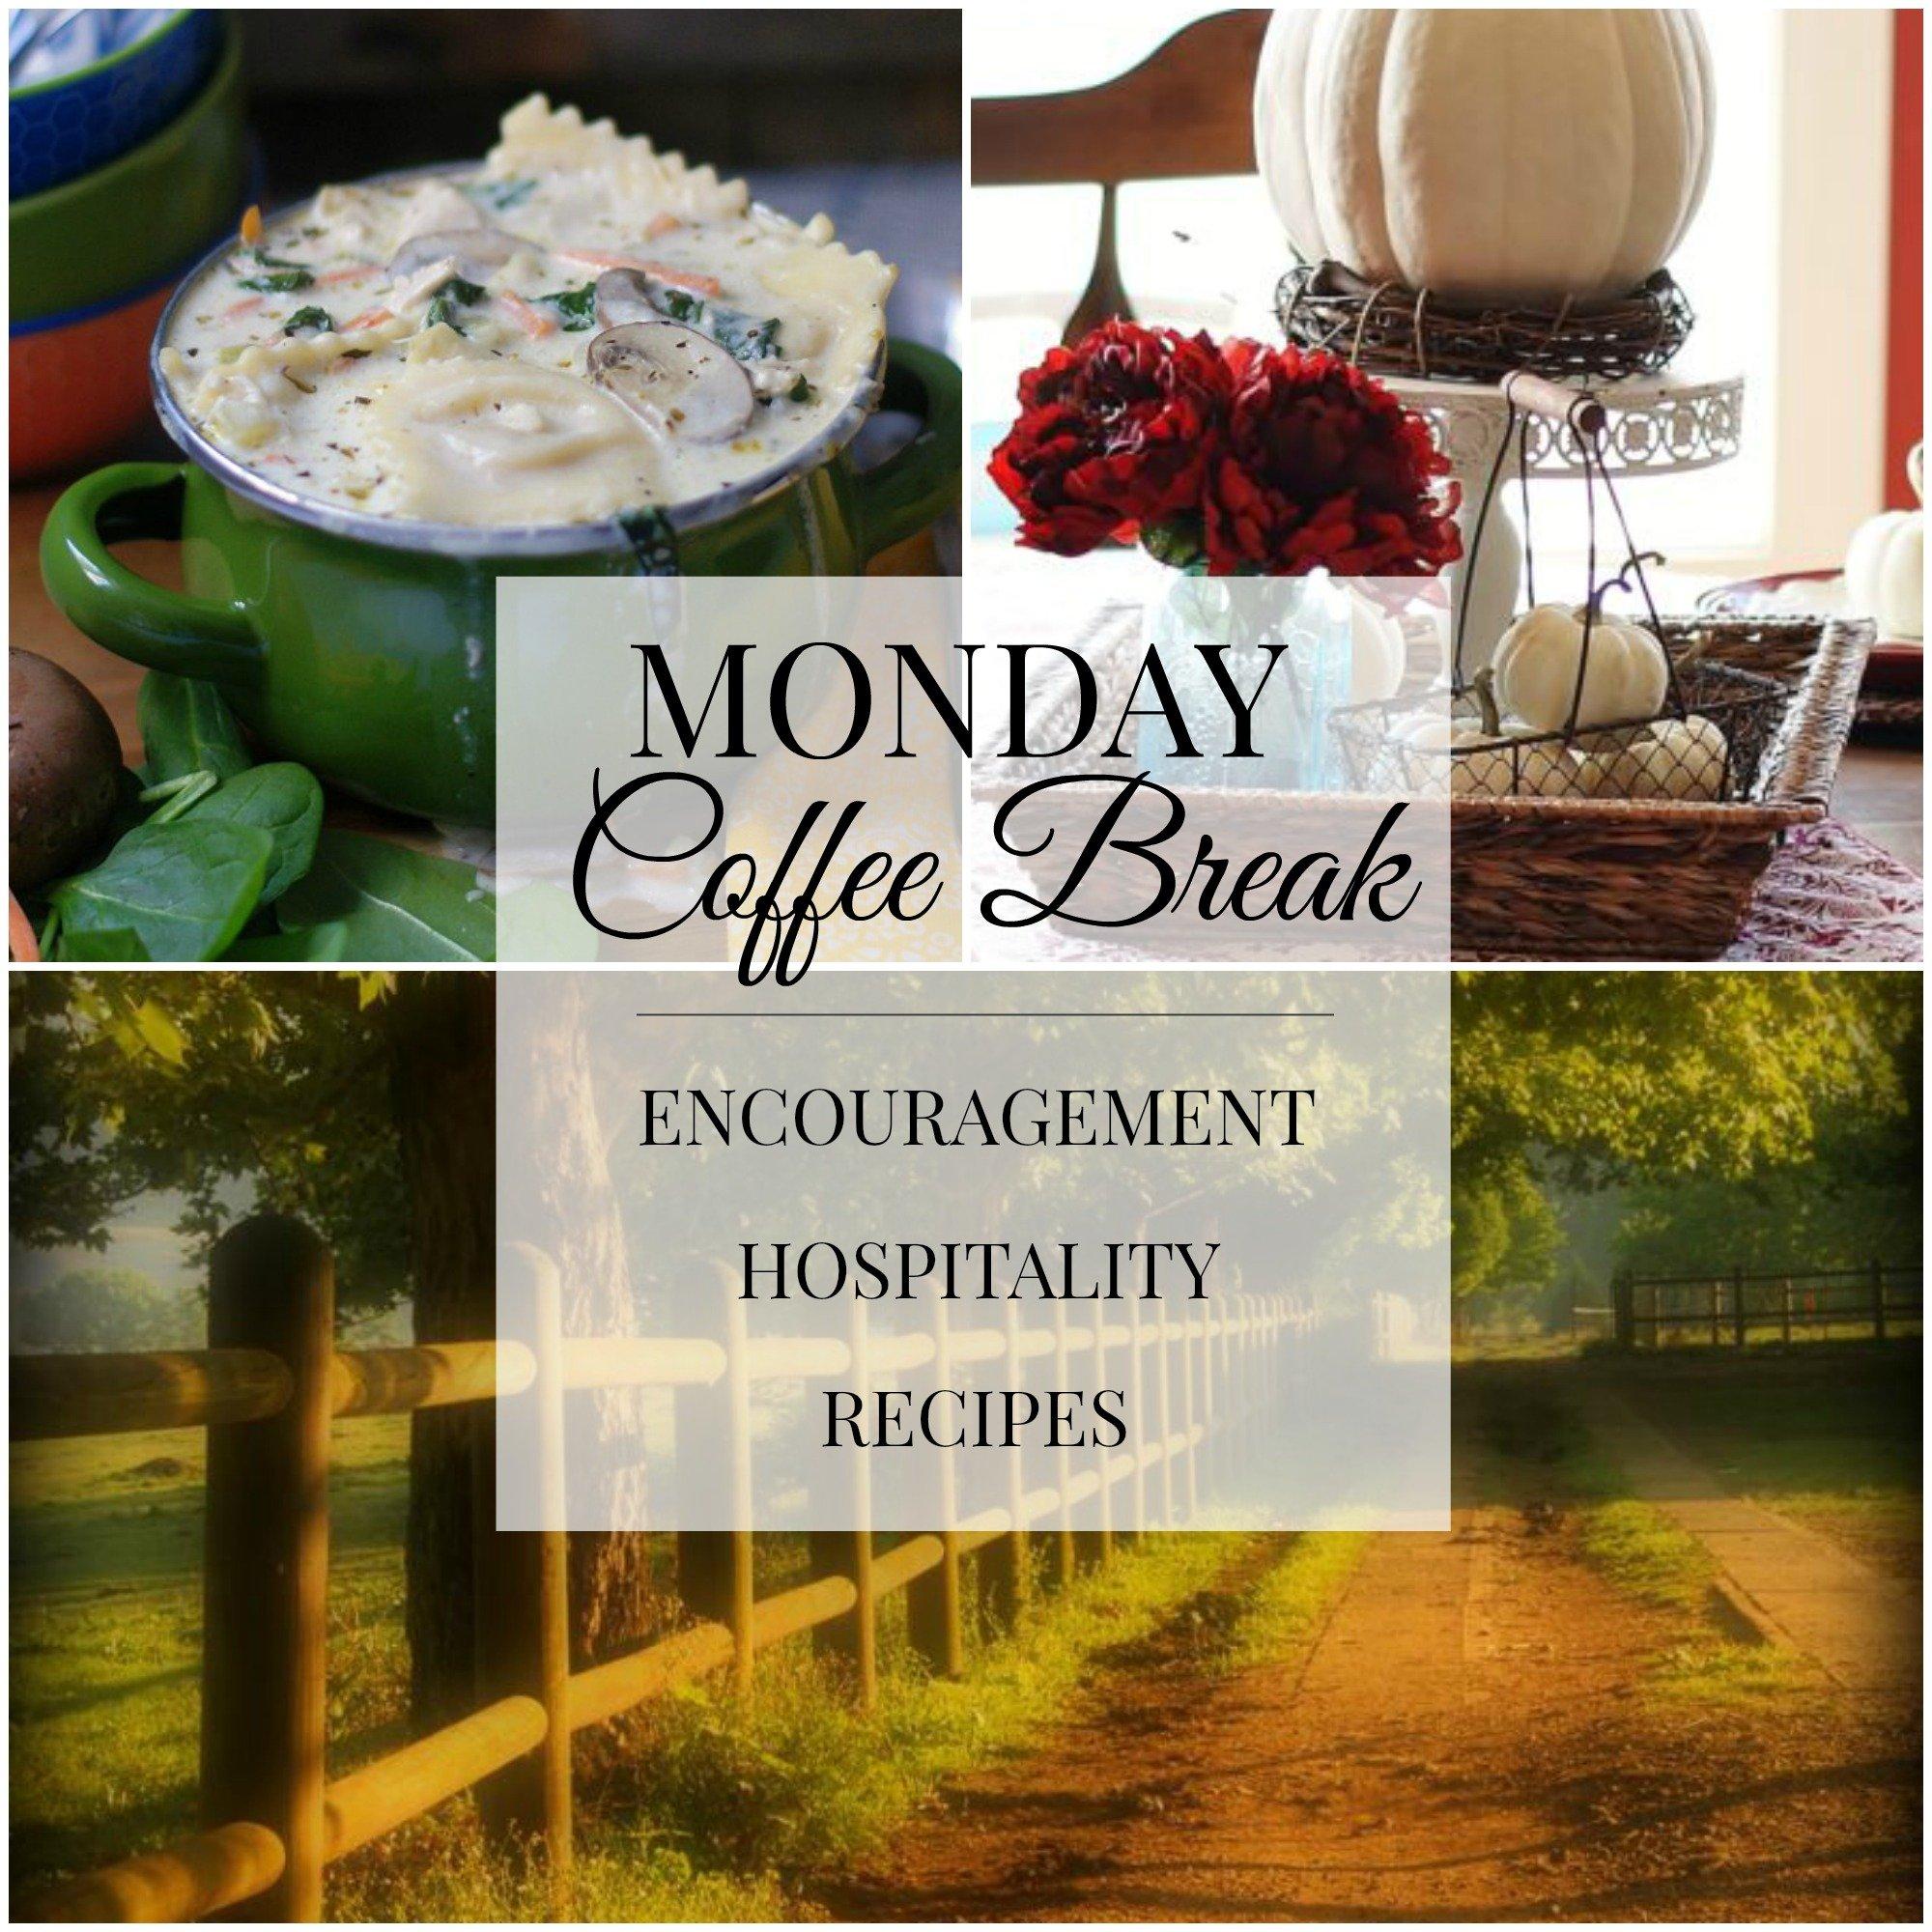 MOnday Coffee Break #57 Title Collage